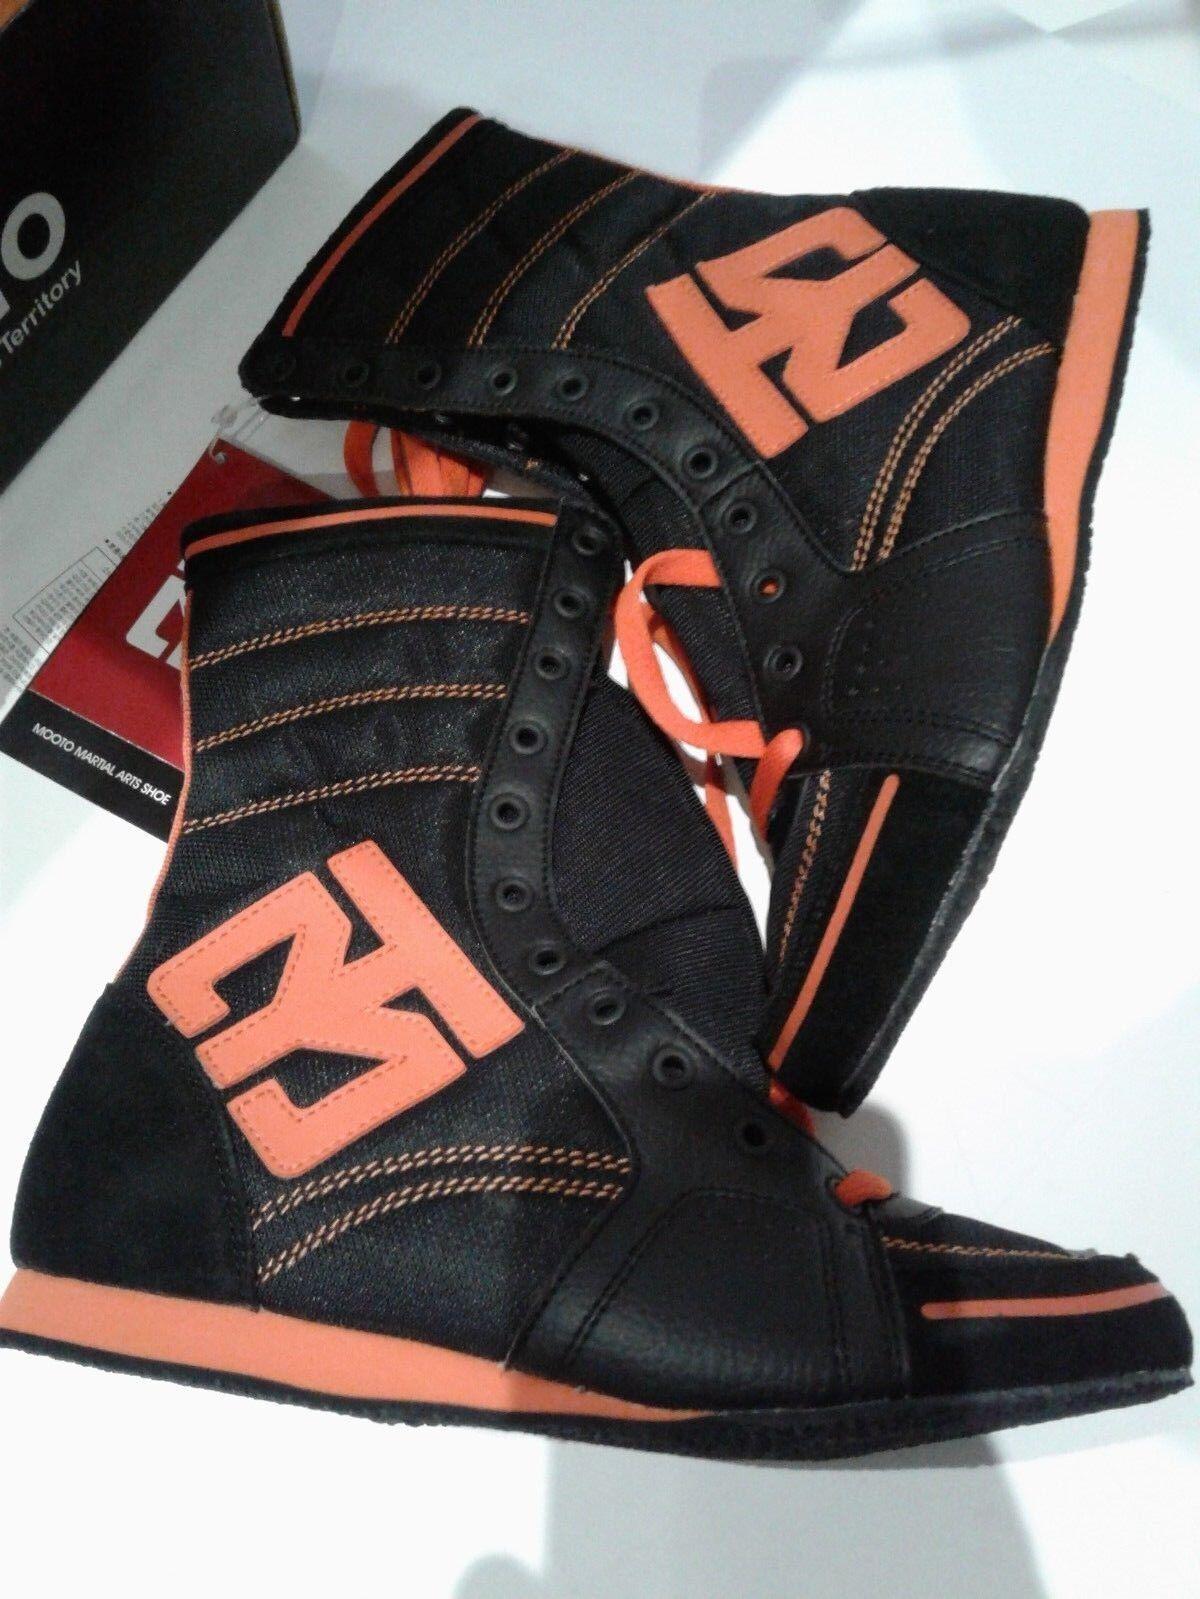 MOOTO Light Shadow All  Purpose Martial Arts shoes Boots - FREE Shipping  no minimum